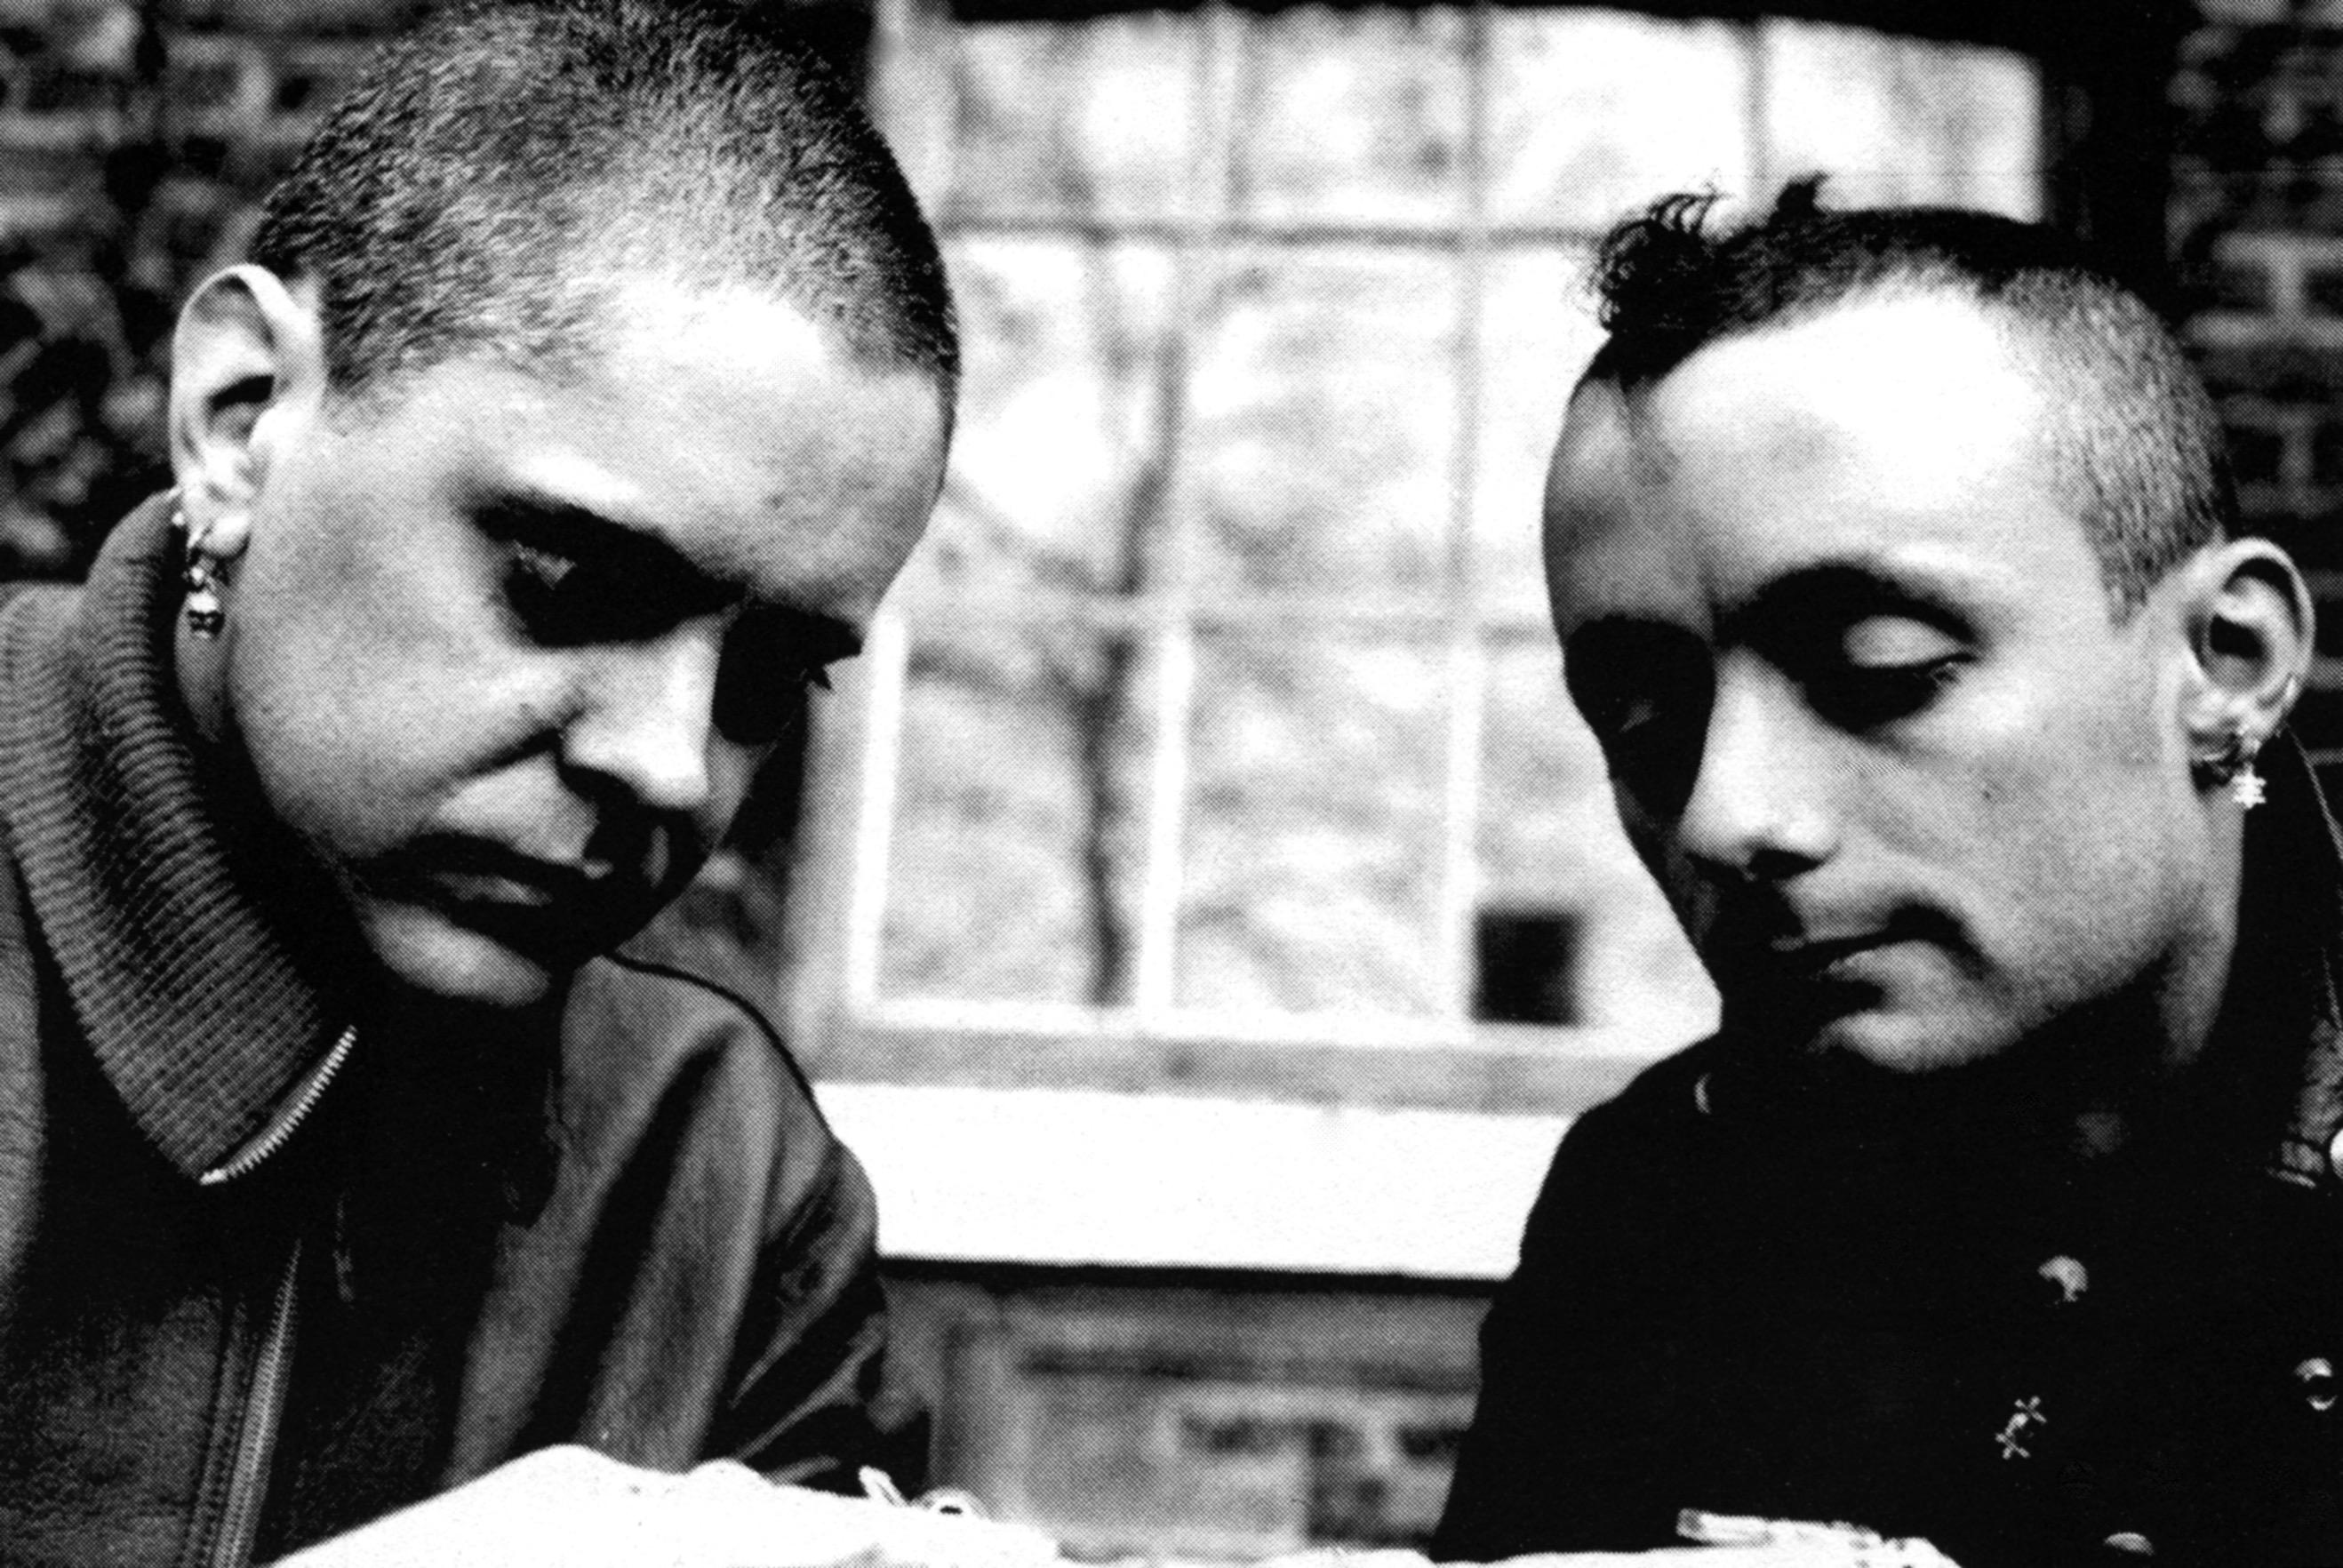 Genesis P-Orridge og David Tibet i 1982. Photo: Courtesy Genesis P-Orridge.